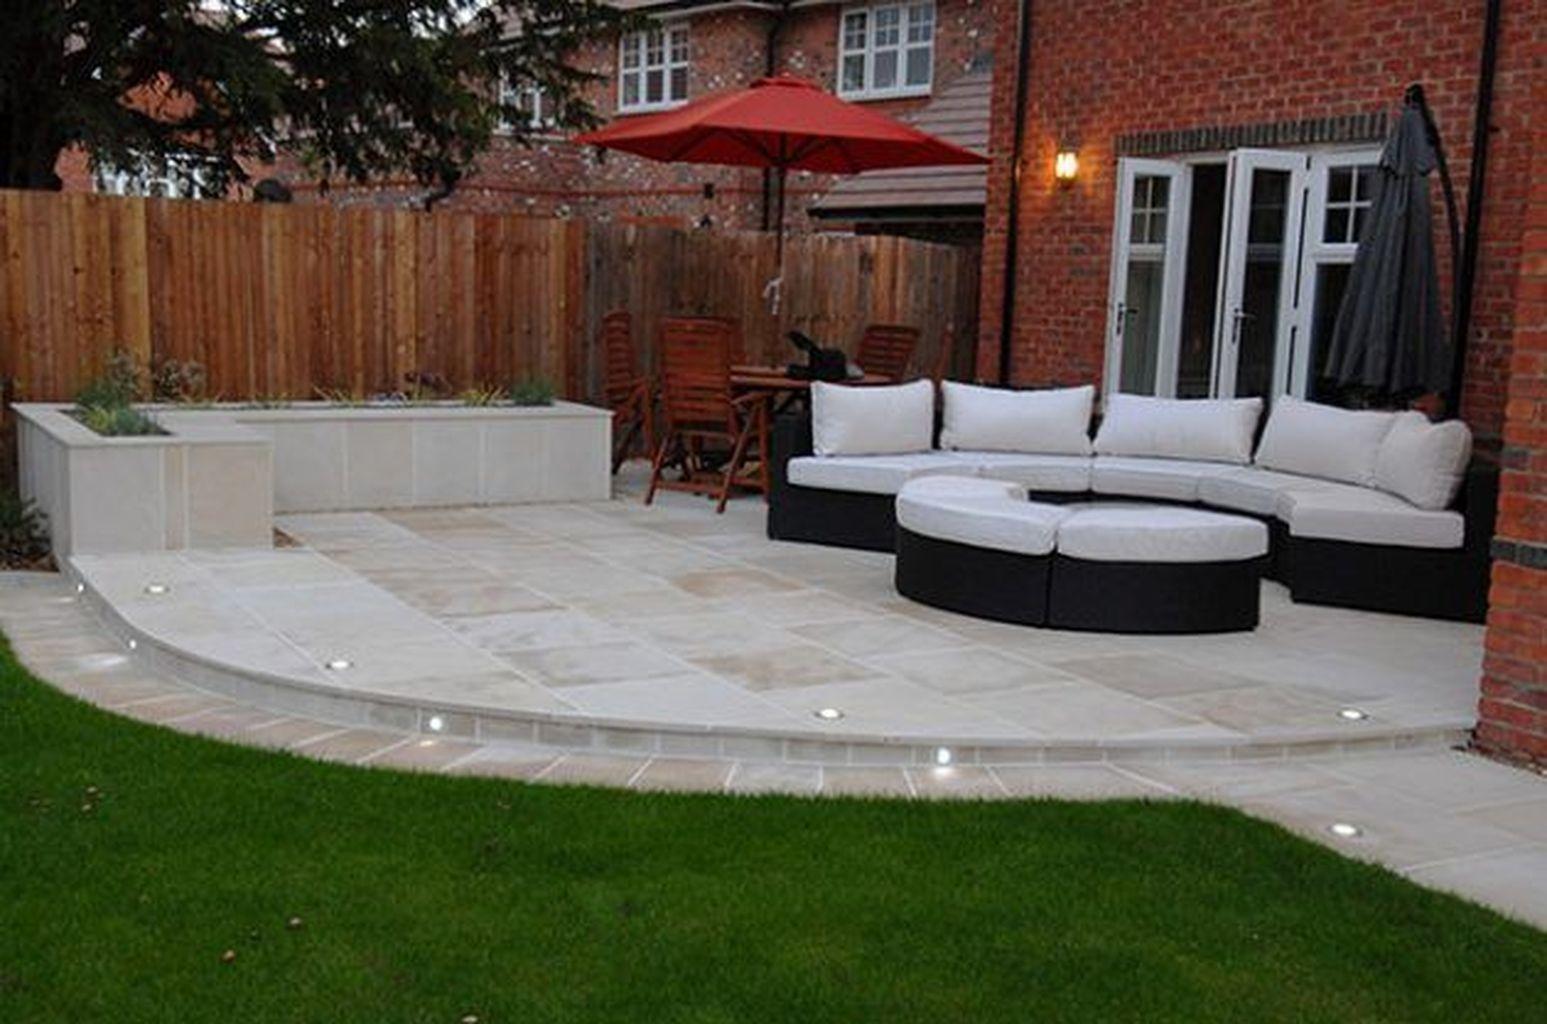 65 Beautiful Spring Garden Ideas For Front Yard And Backyard Landscaping Modern Garden Patio Patio Garden Design Modern Garden Design